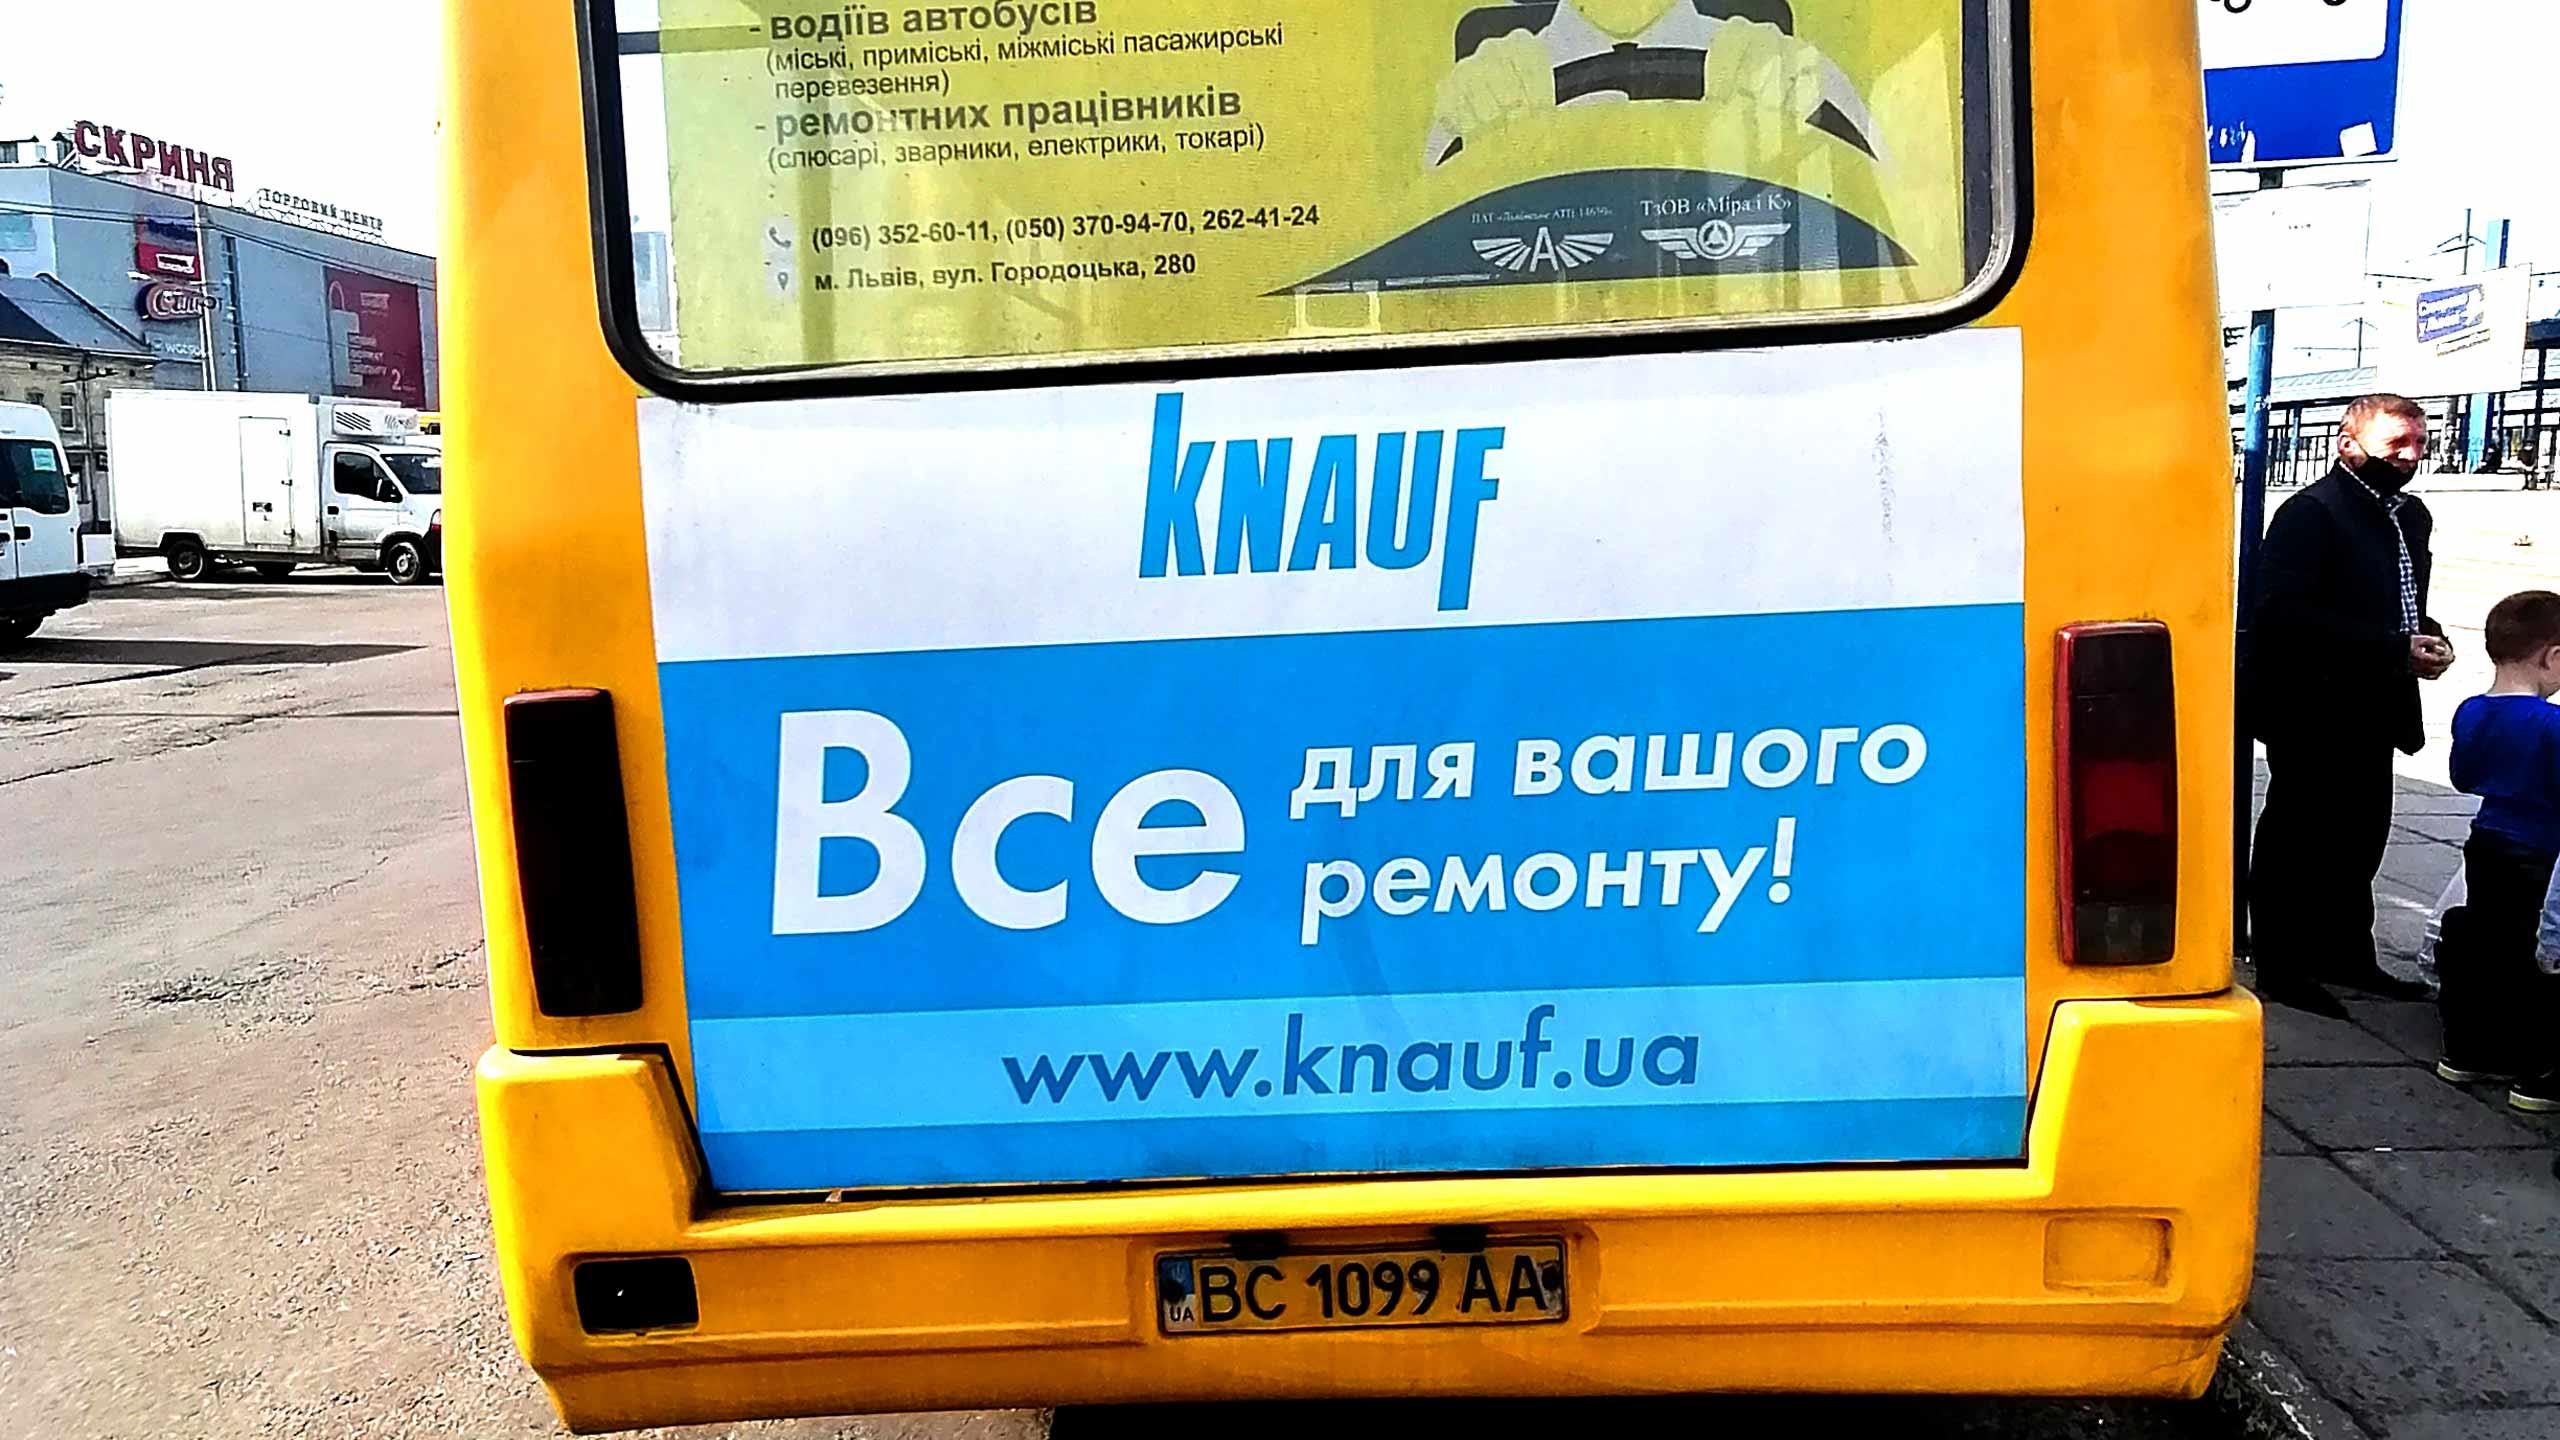 реклама на маршрутках днепропетровск